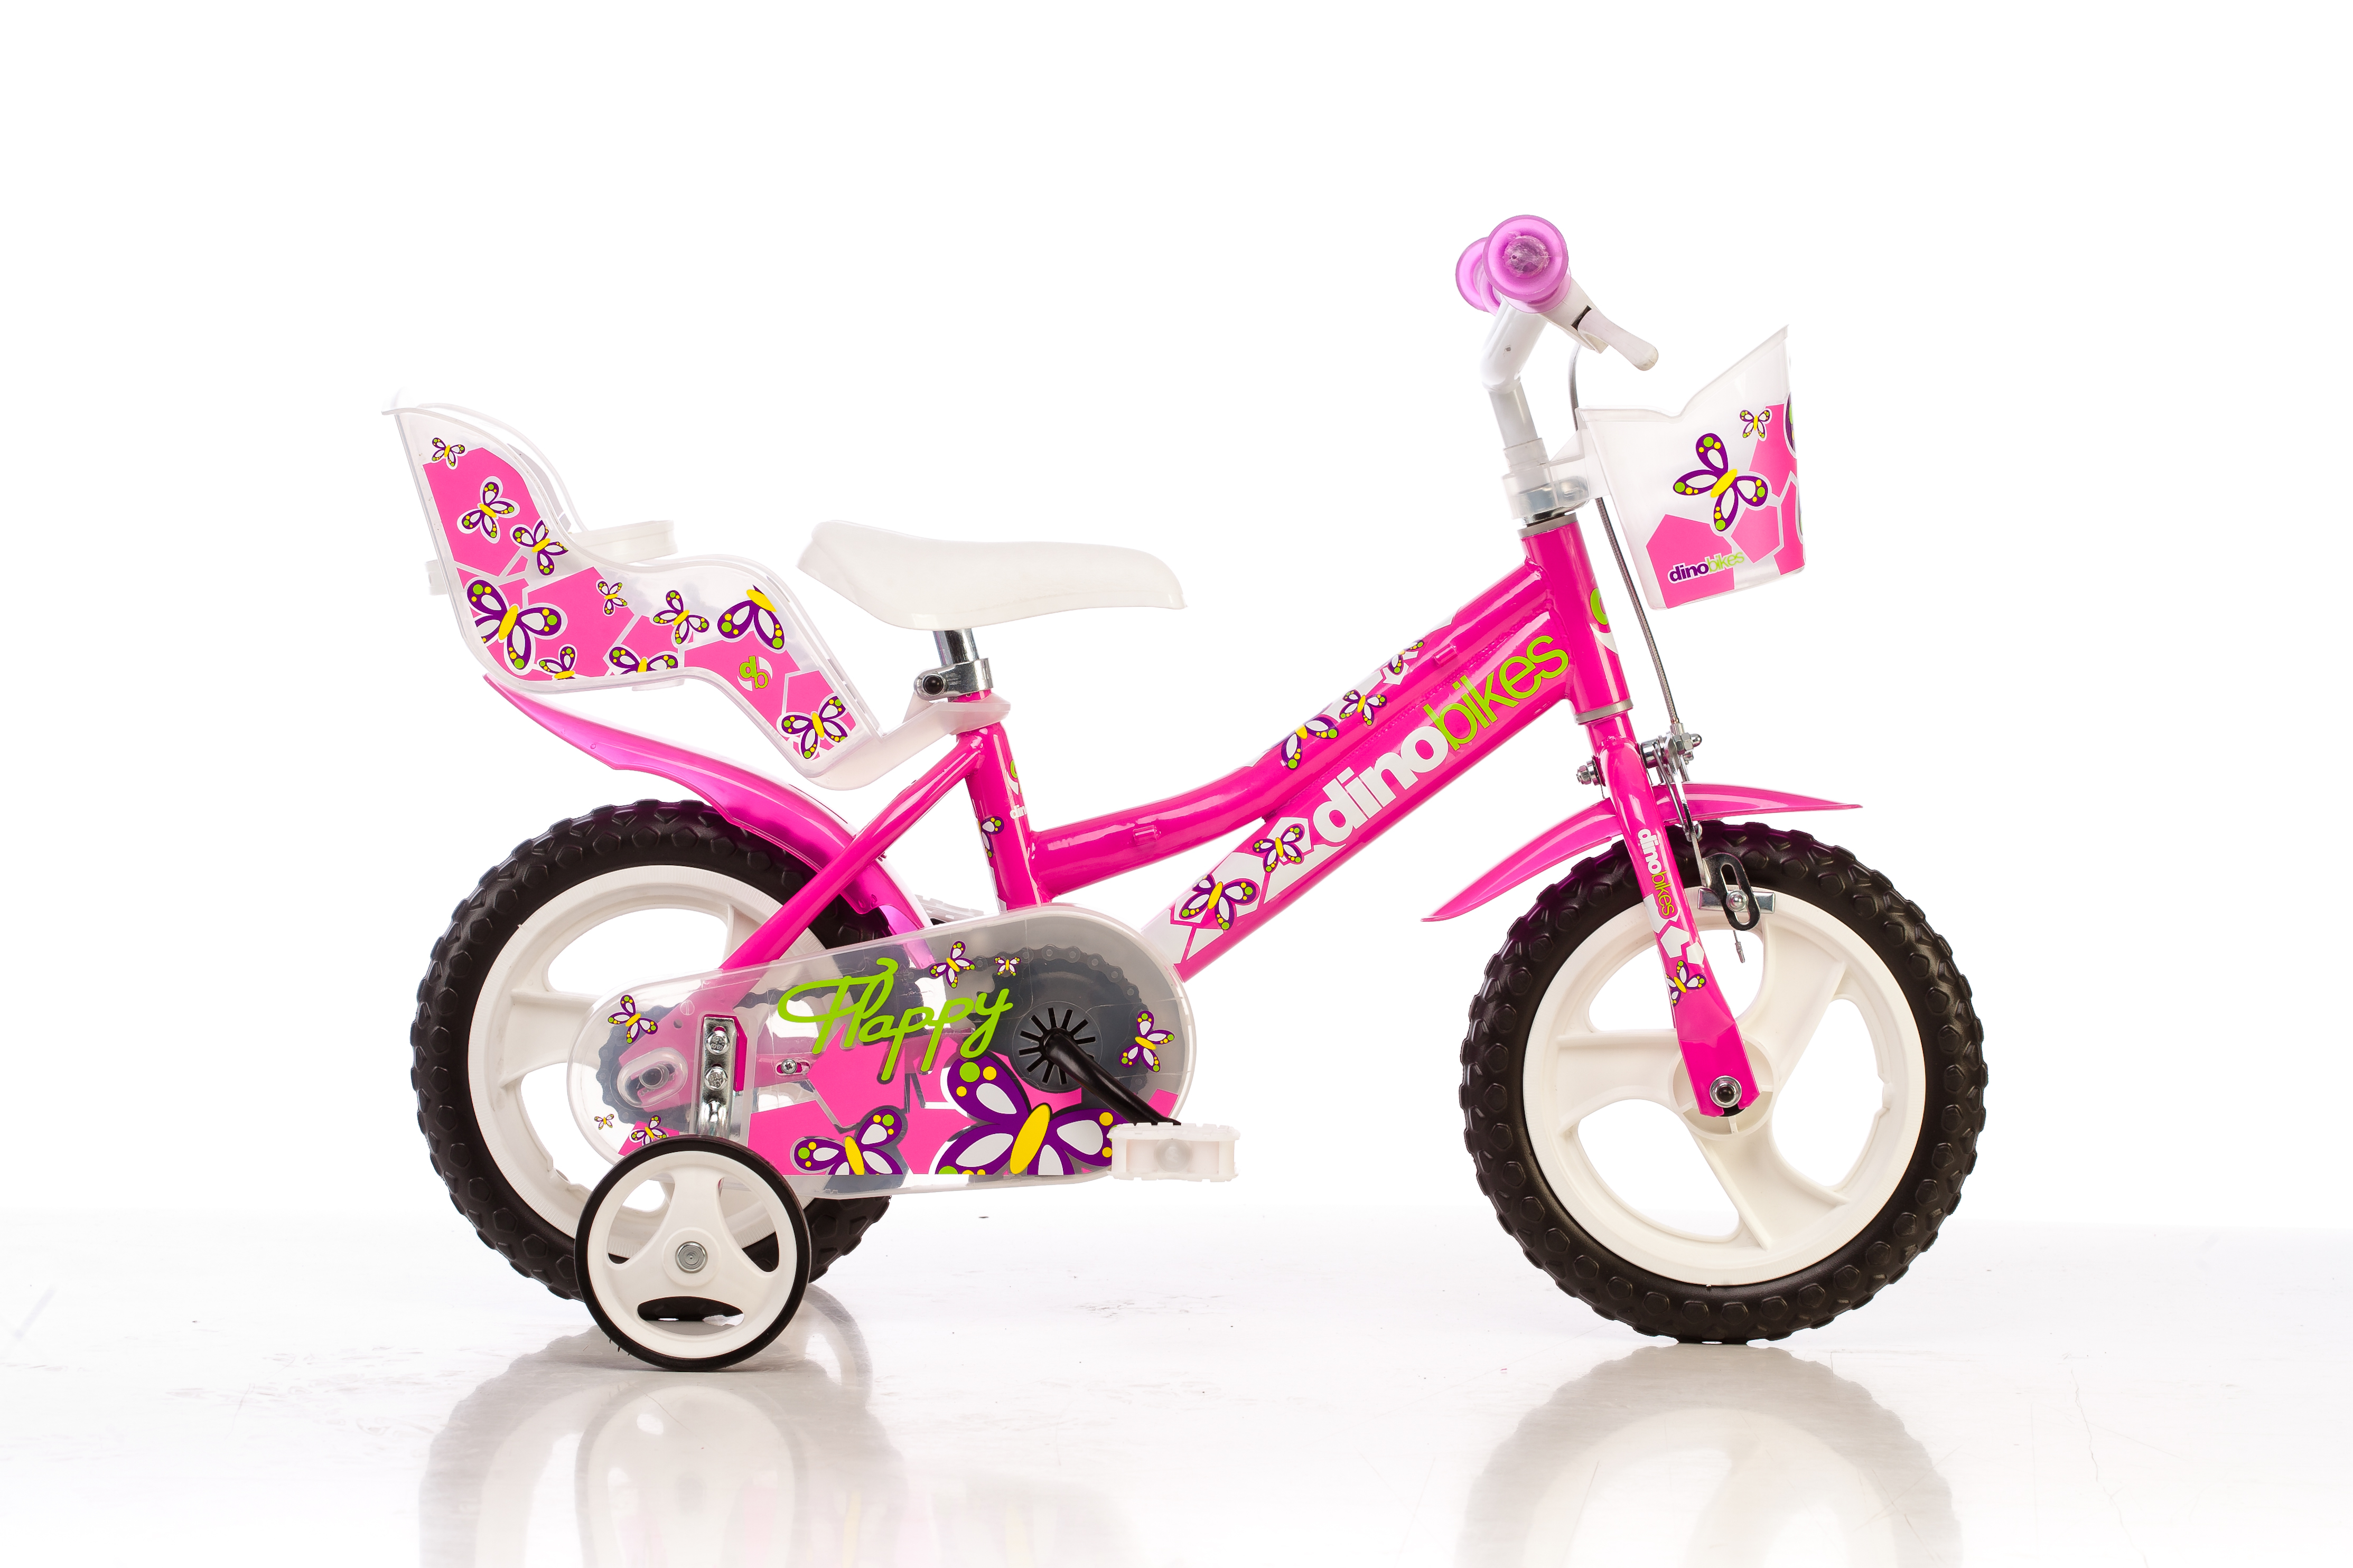 Kinderfahrrad Dino 126R - Pink 12 Zoll